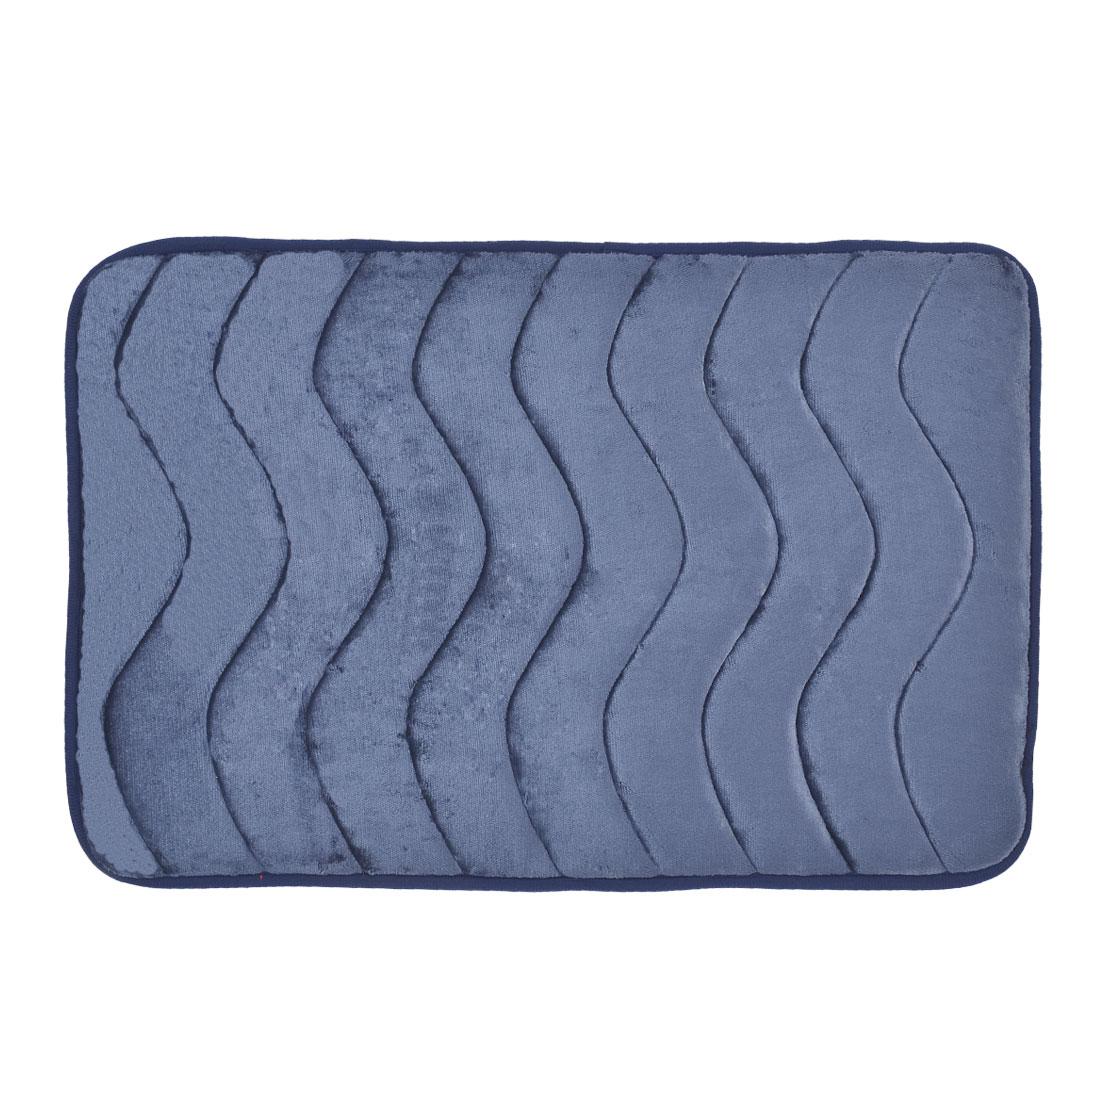 Bathroom Villus Surface Wavy Pattern Absorbent Slip-resistant Pad Shower Rug Dark Blue